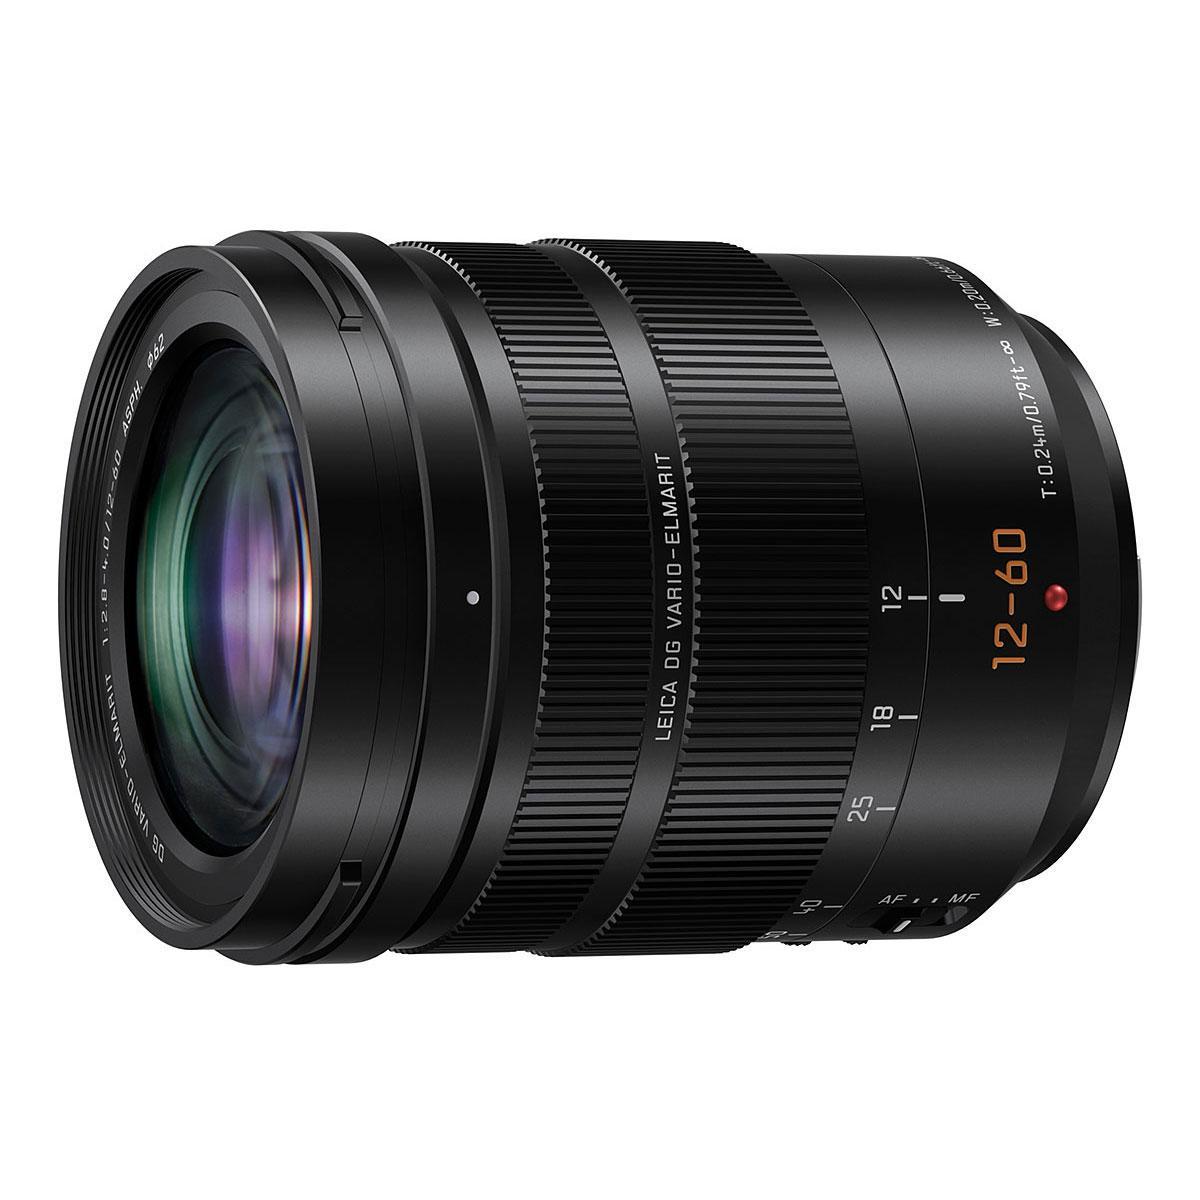 Panasonic Leica DG Vario-Elmarit 12-60mm f/2.8-4.0 ASPH POWER O.I.S.